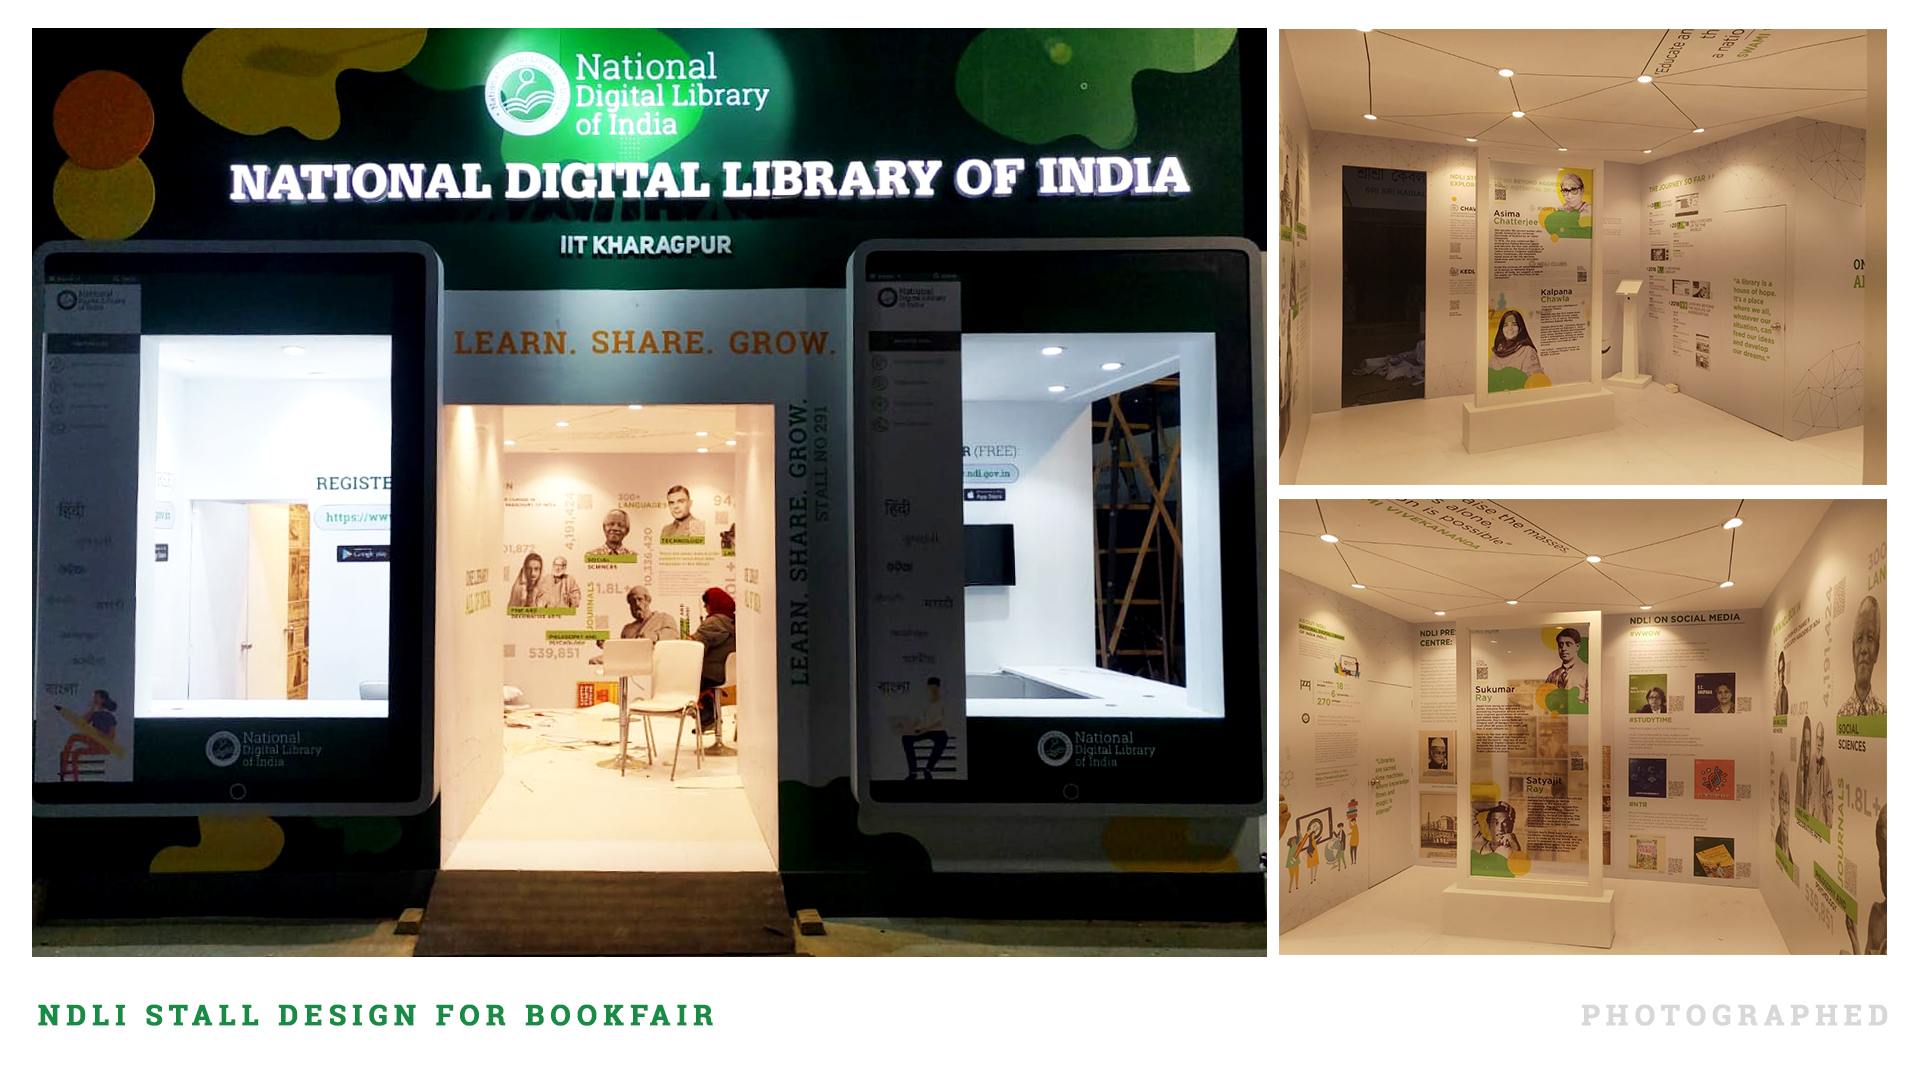 NDLI Stall Design